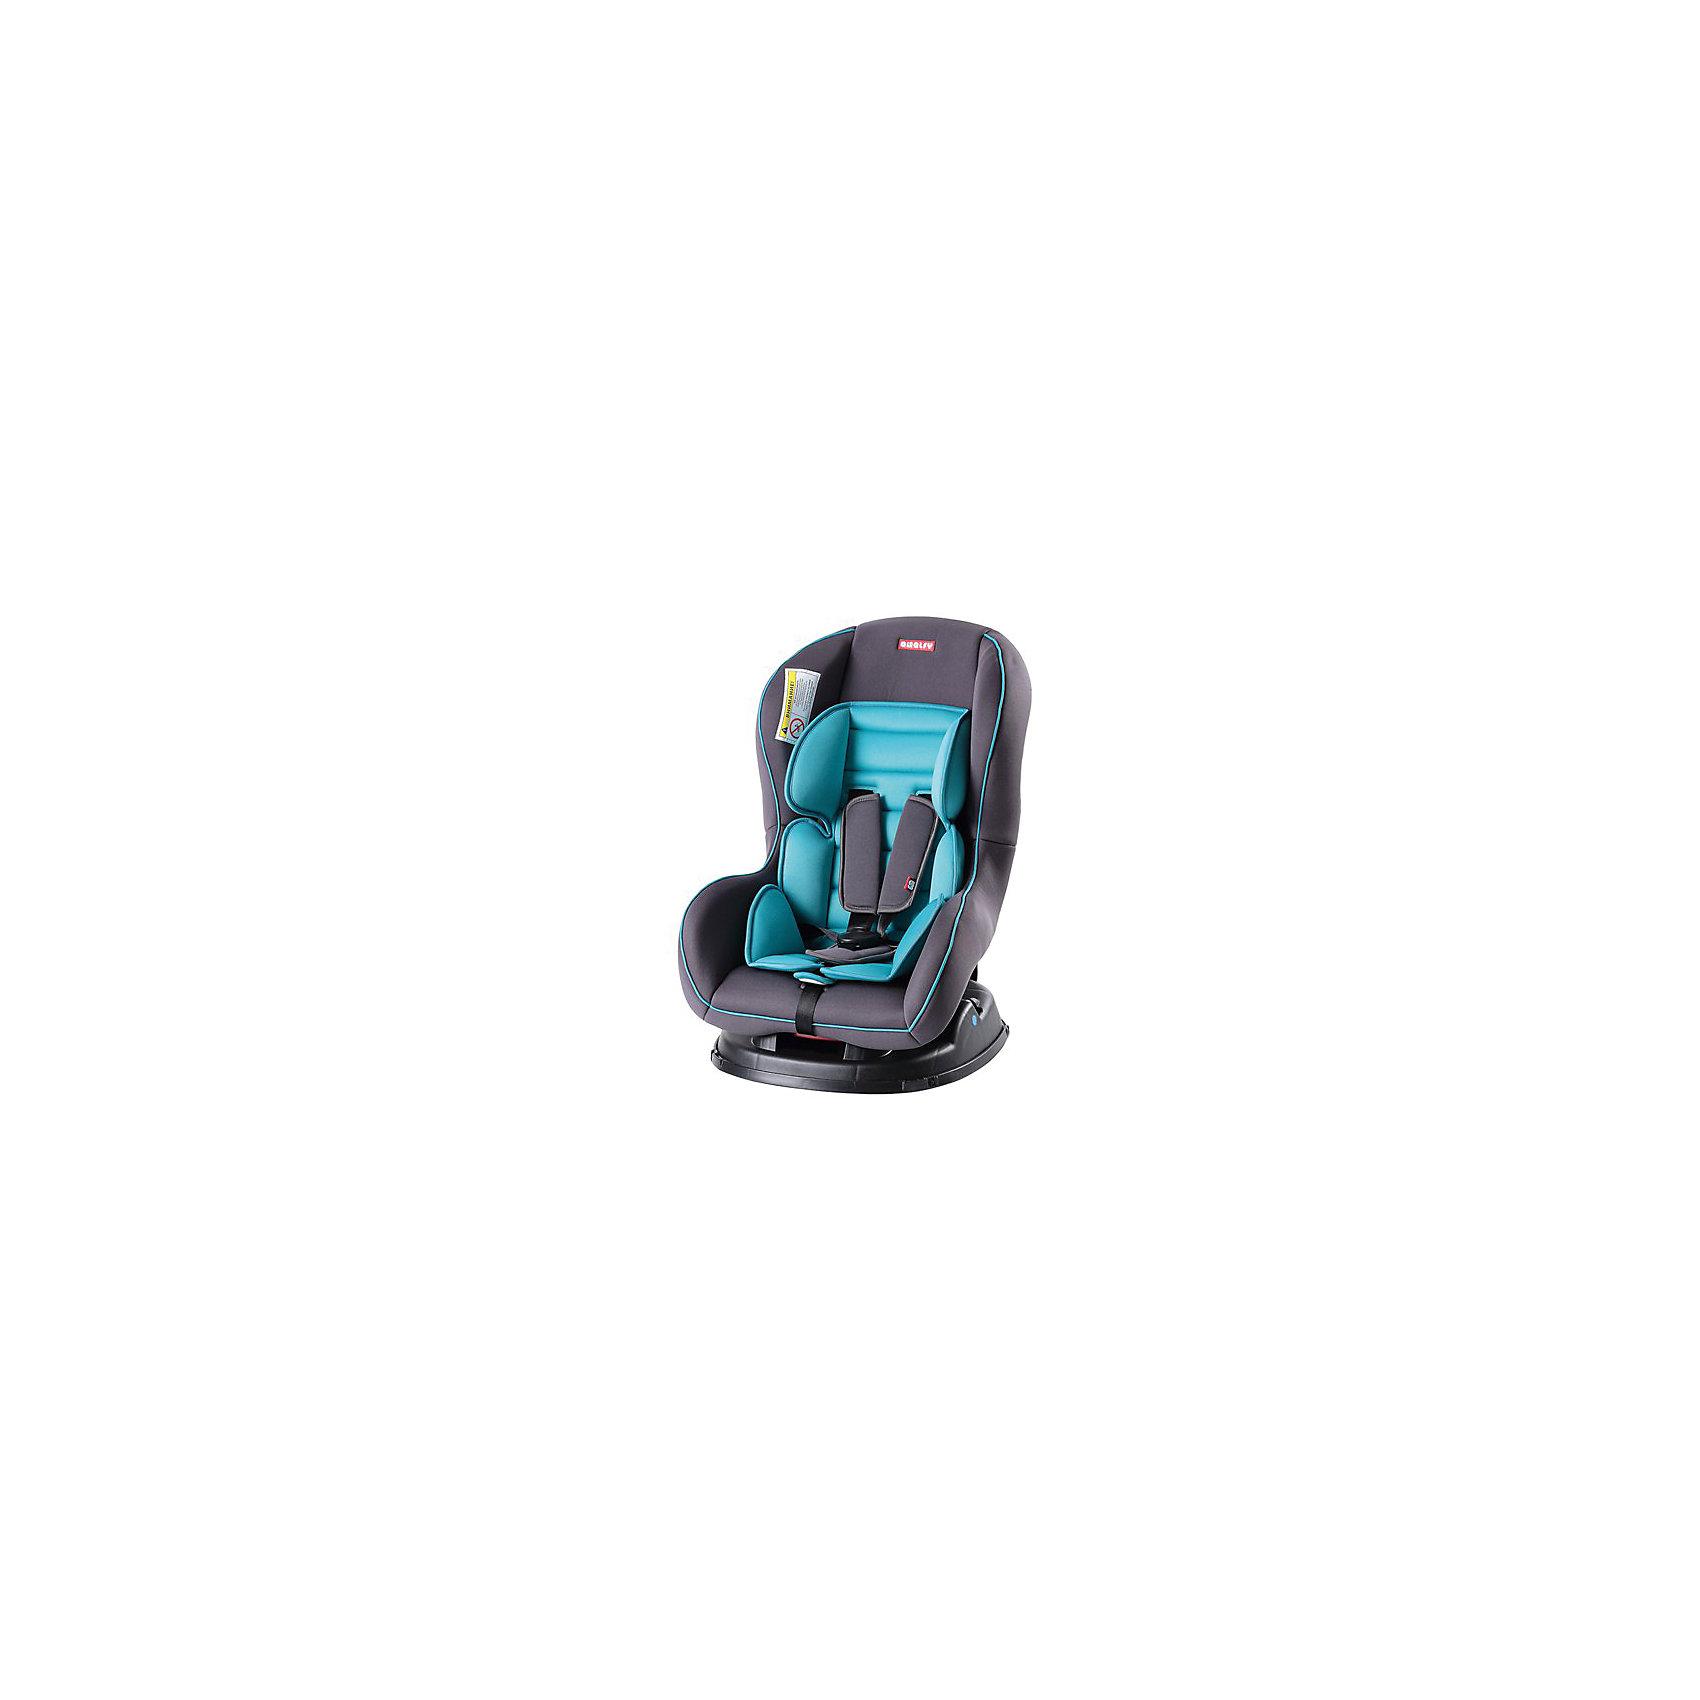 - Автокресло НB-383, 0-18 кг, Amalfy, серый amalfy нb 508 black